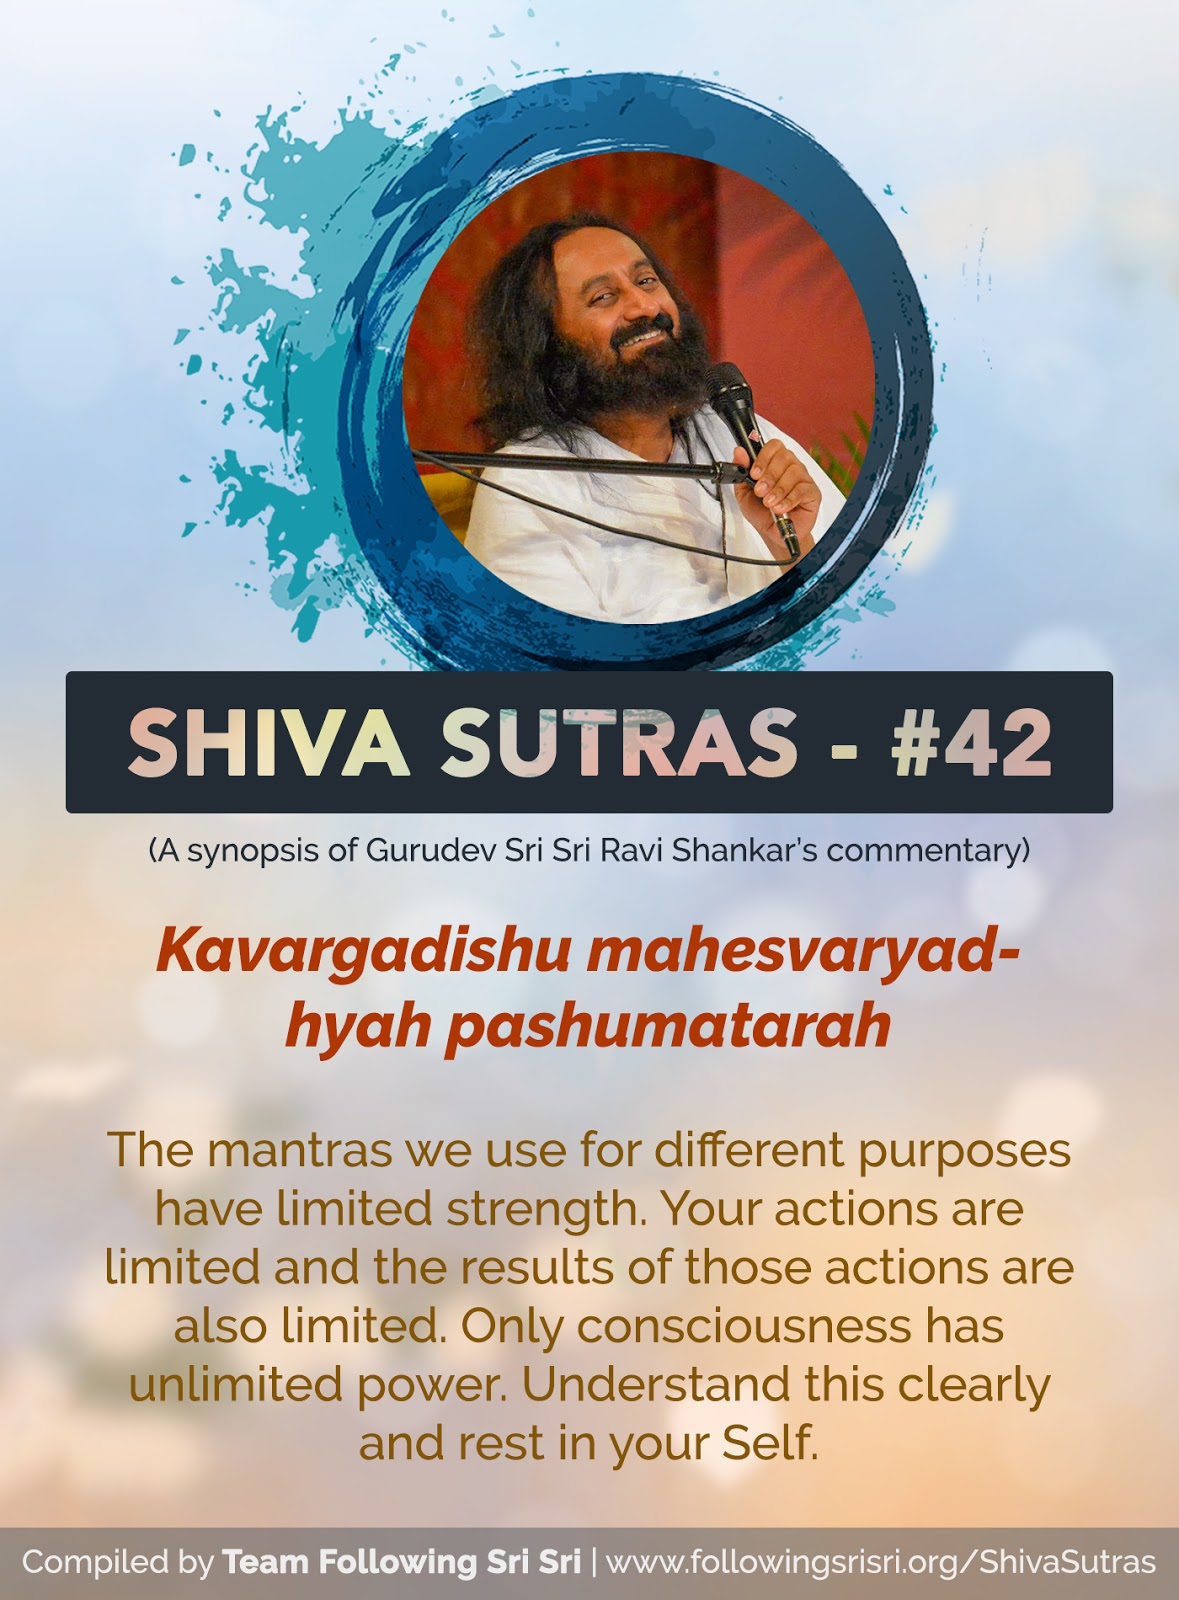 Shiva Sutras - Sutra 42